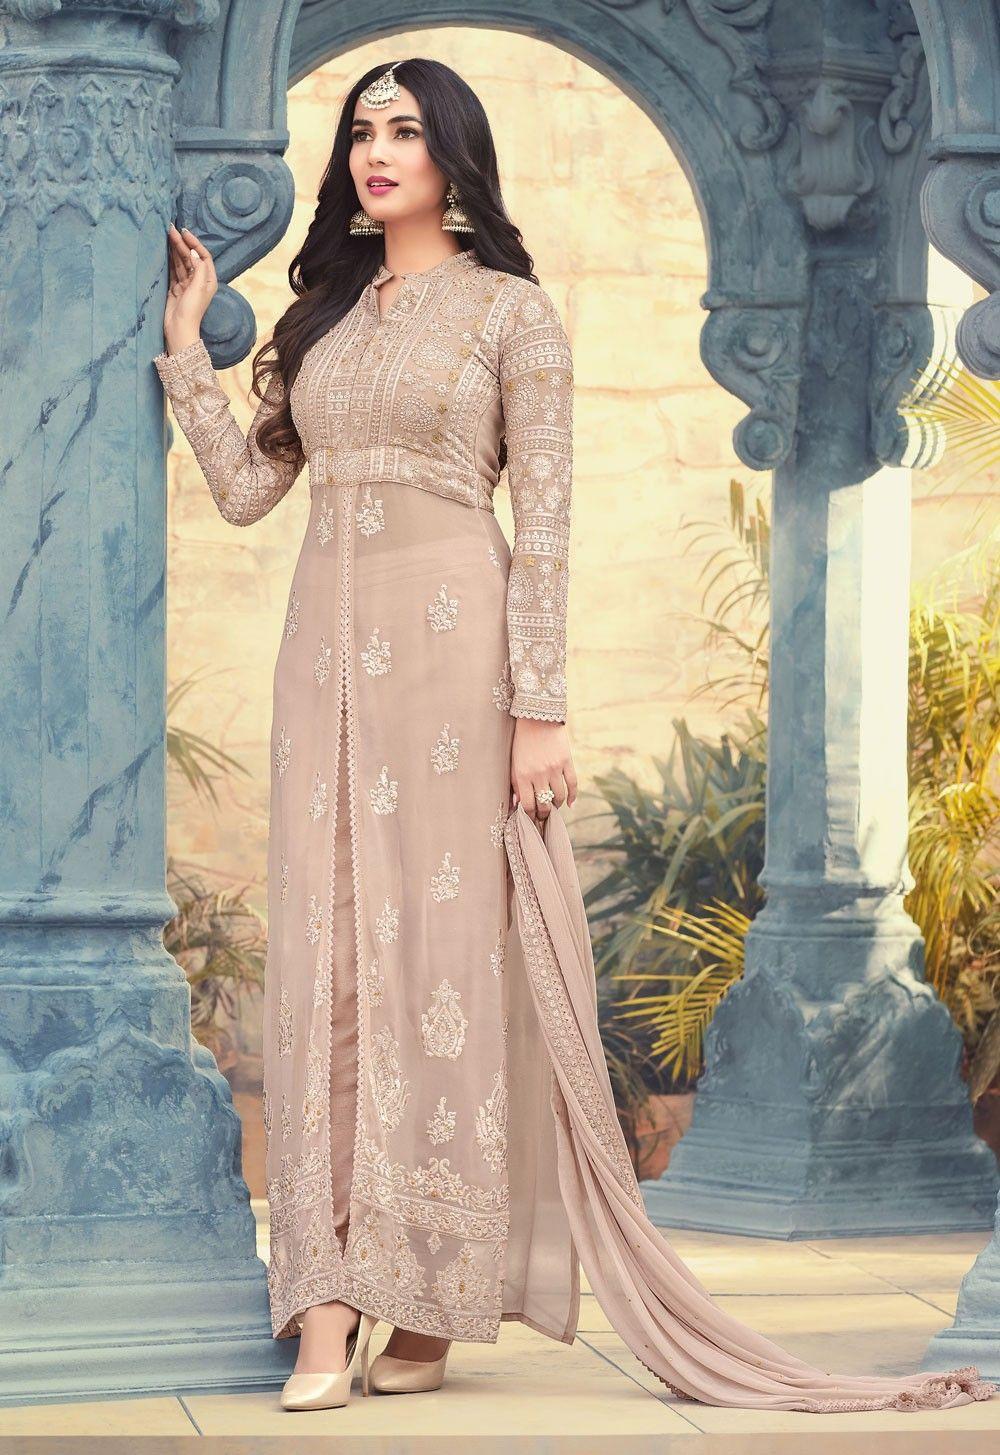 a344a5af6d Indian Pakistani Latest Salwar Kameez Designs 2018 For Modern Ladies | Eid  Fashion Love